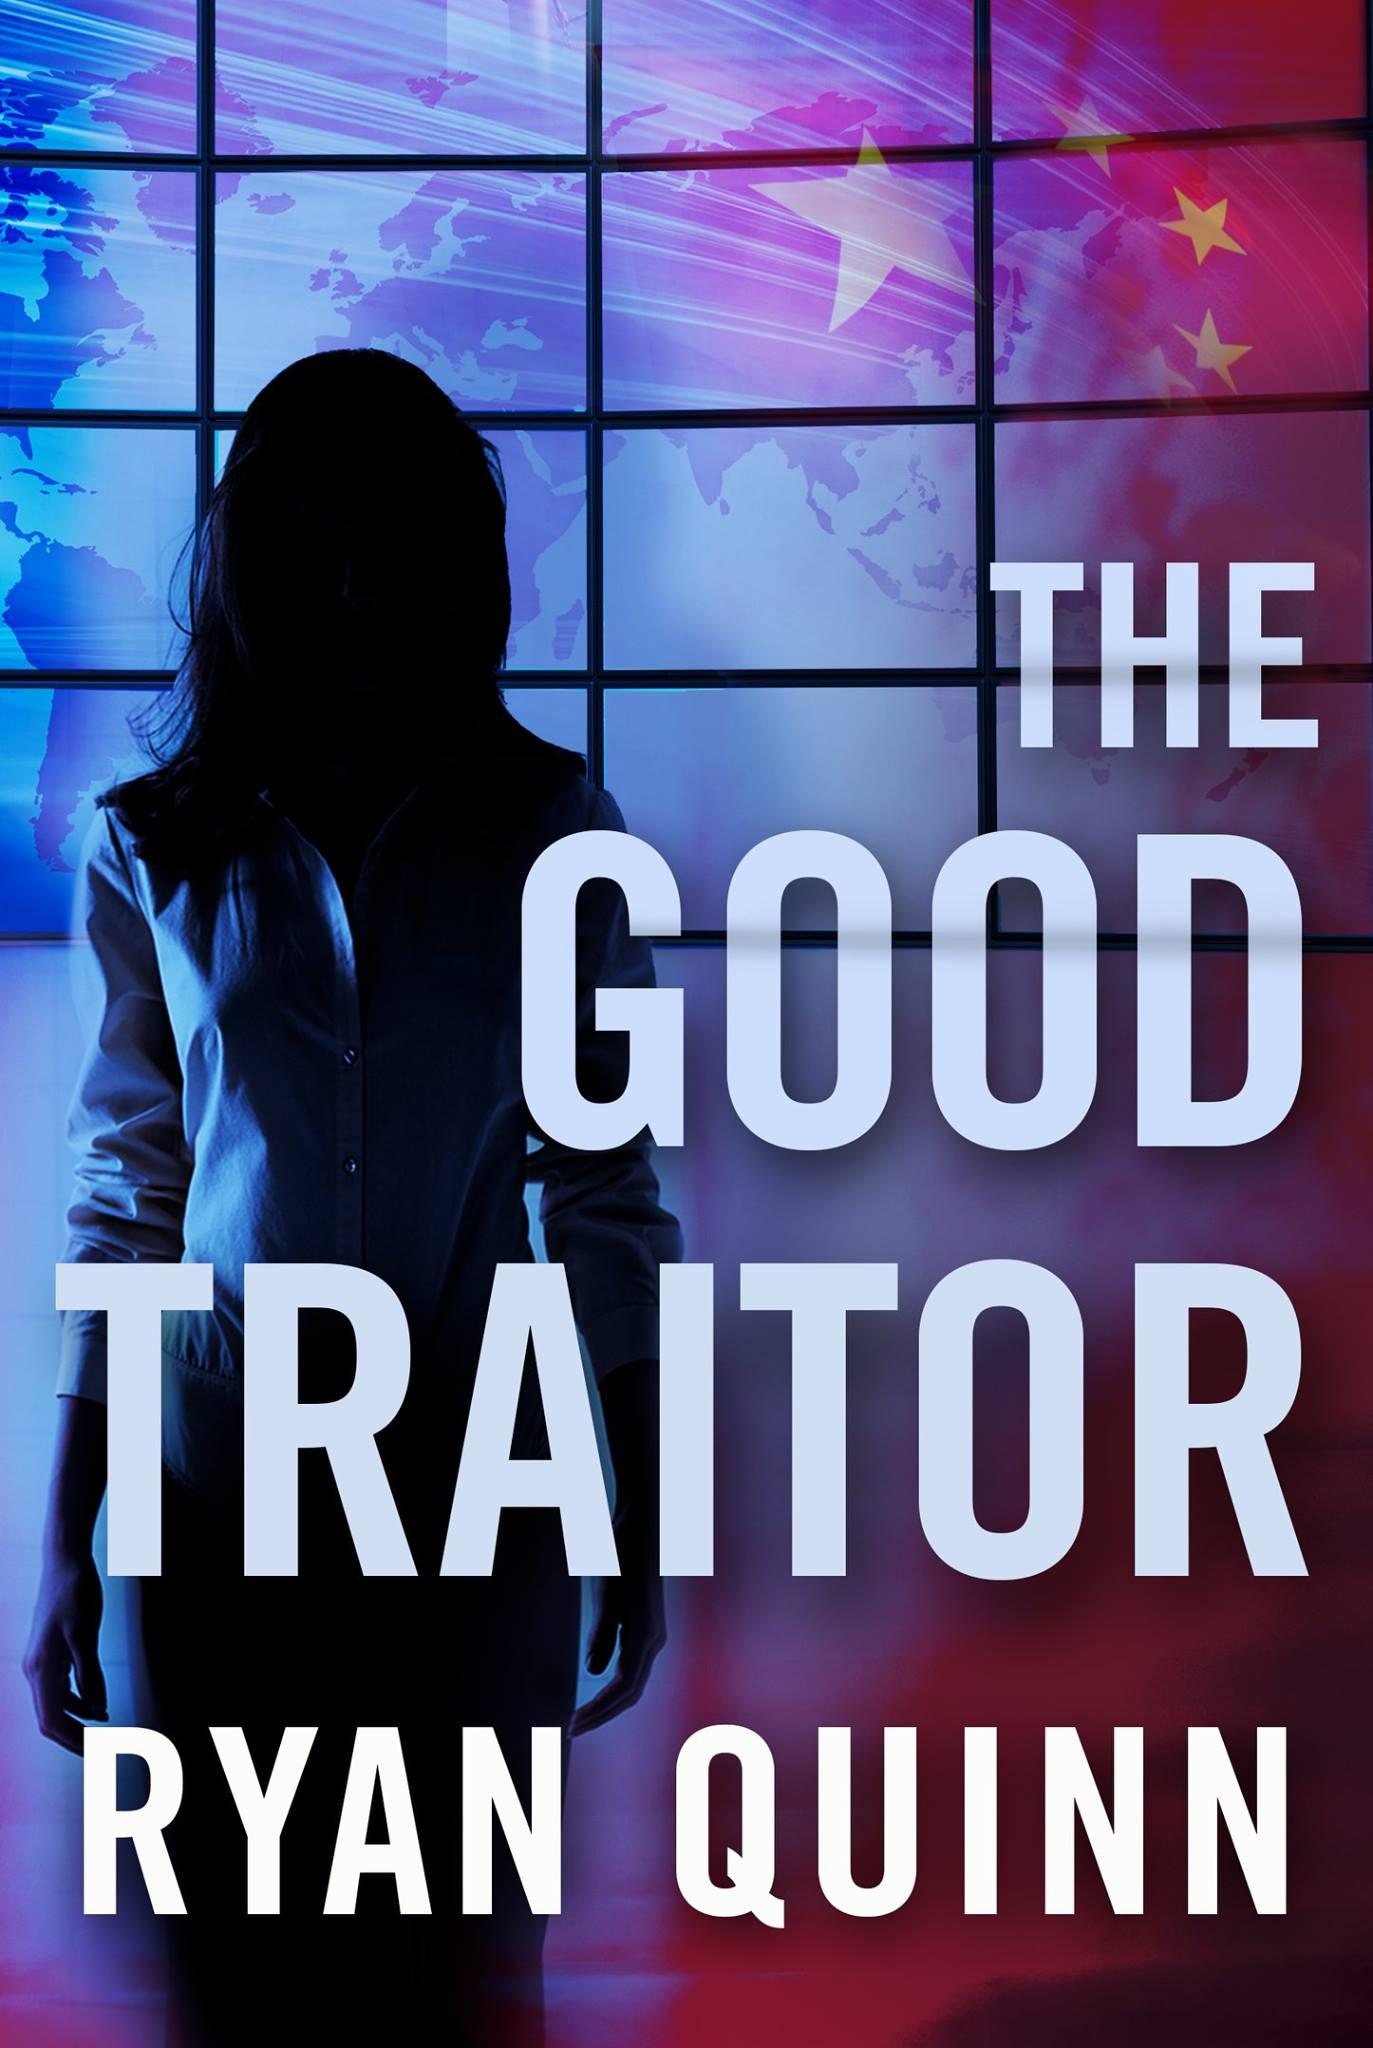 The Good Traitor by Ryan Quinn